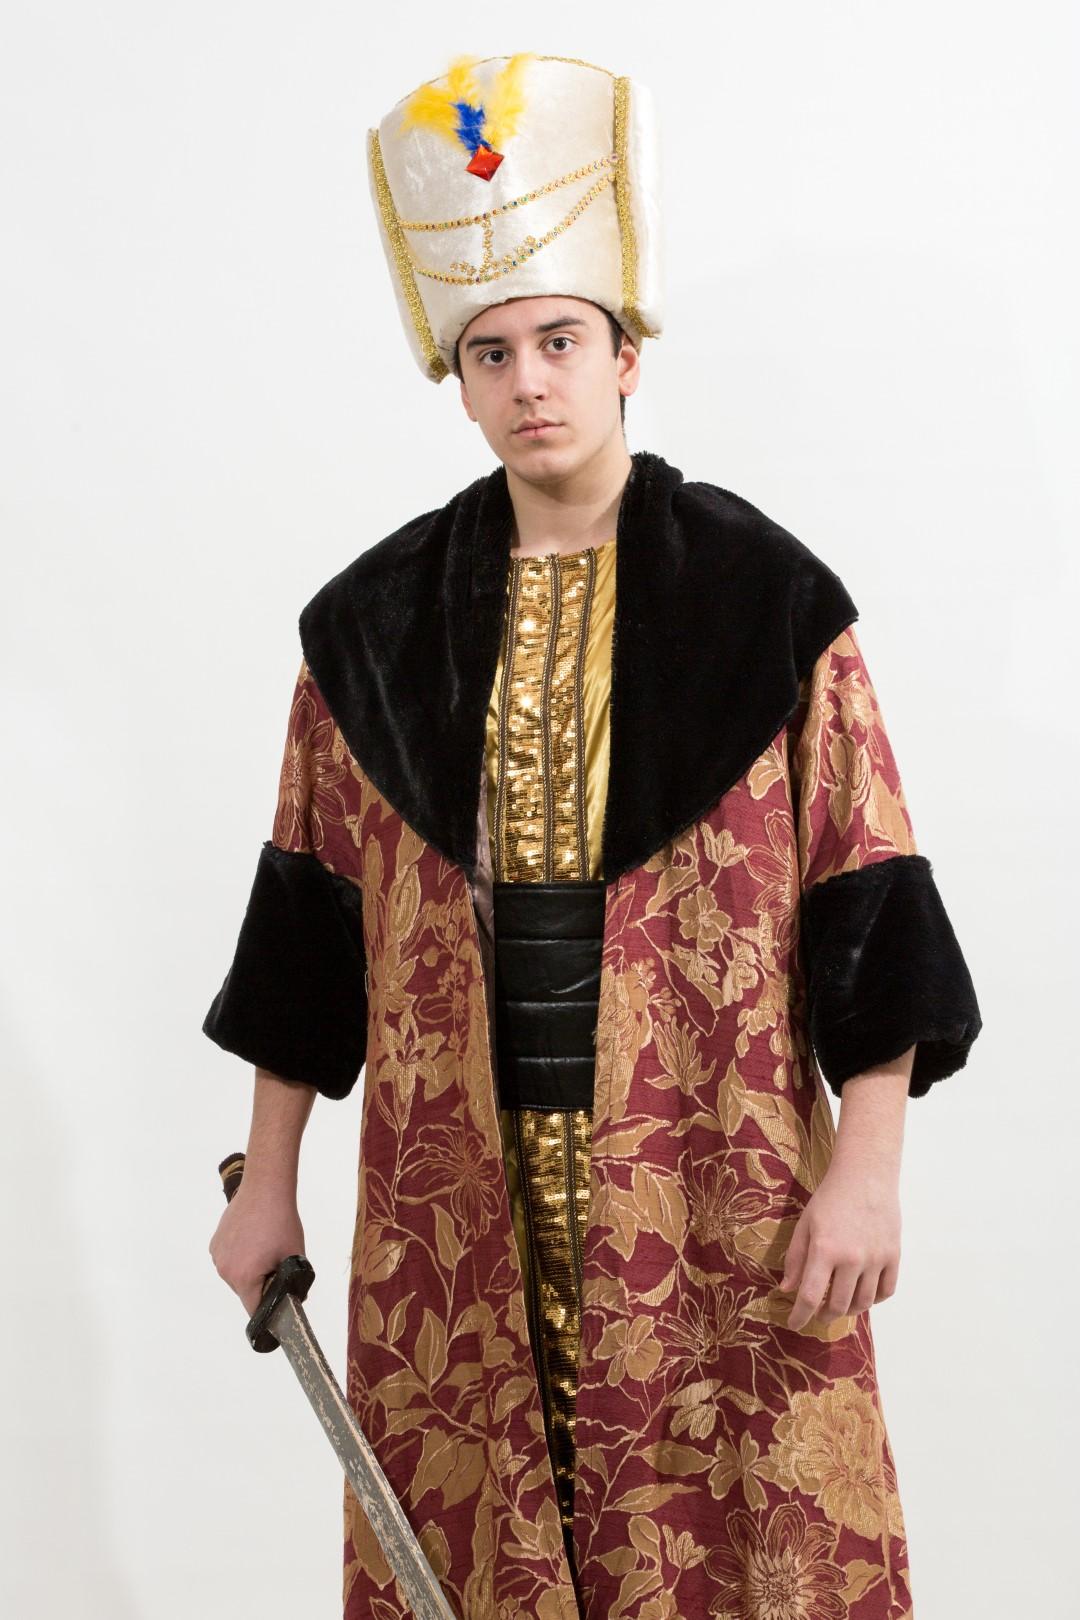 osmanlı-padişah-kostum-siyah-kurk